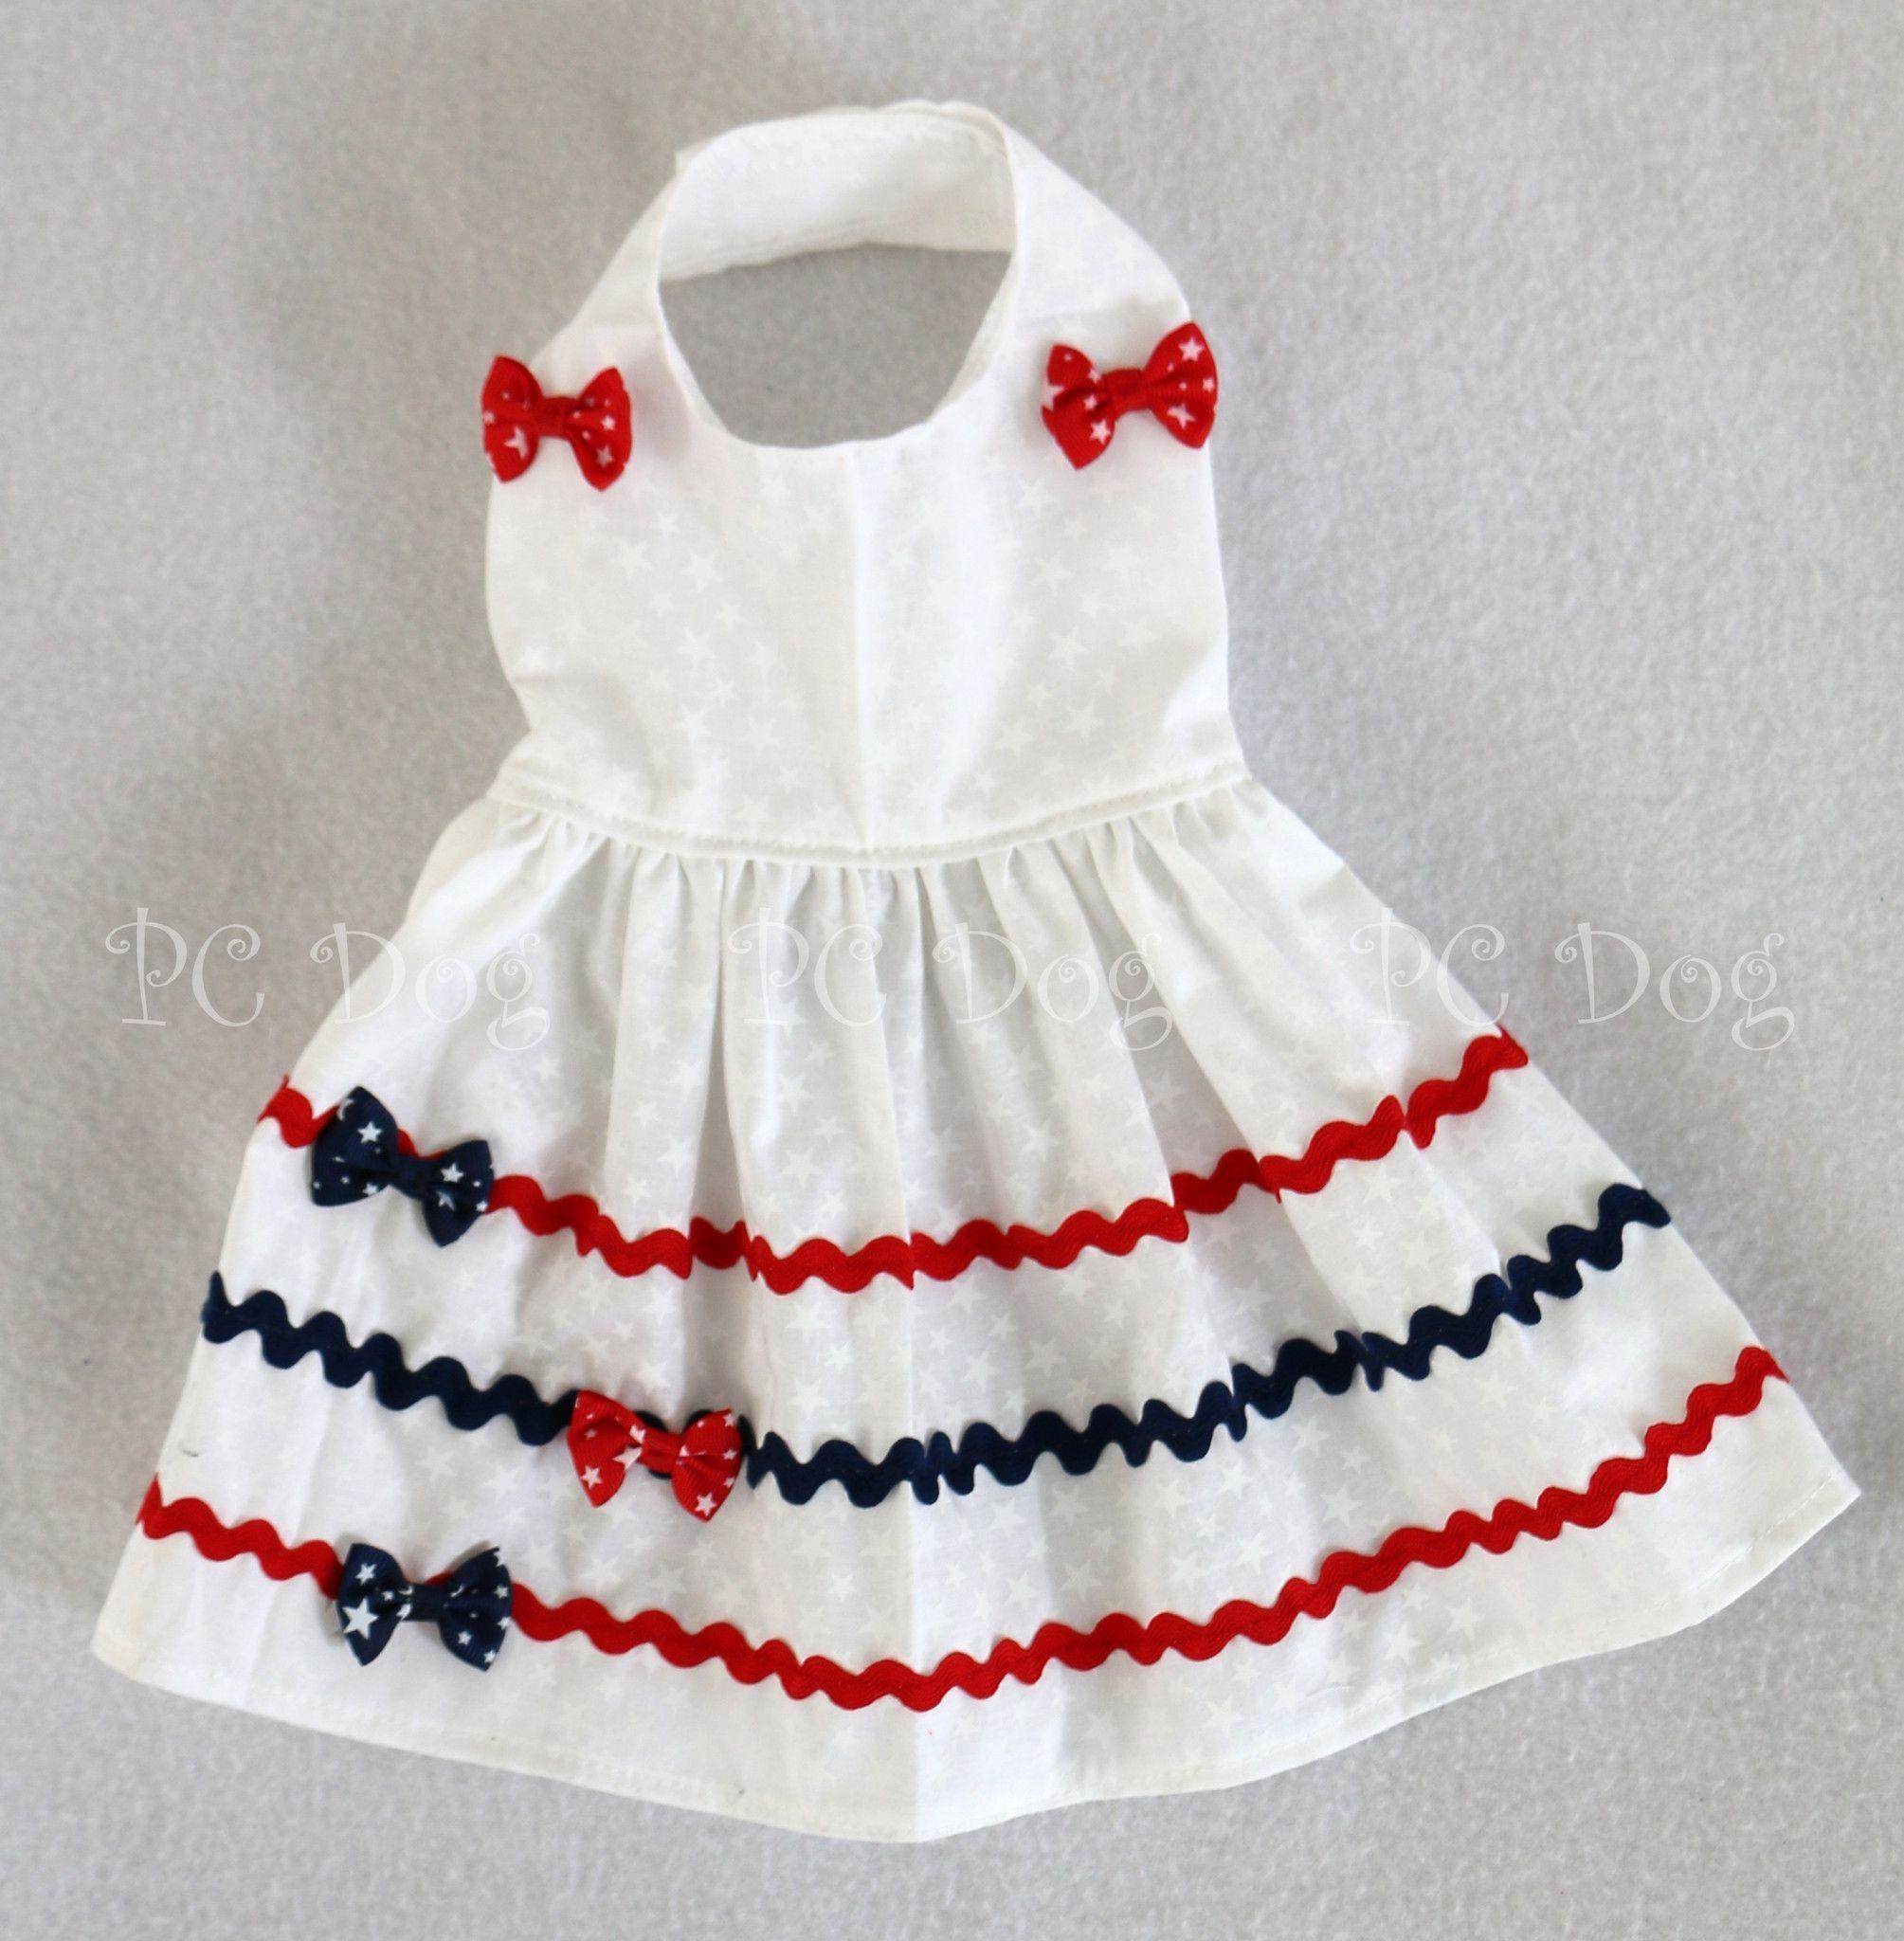 American Colors Dress | Costura | Pinterest | Perruno, Modelo y Costura